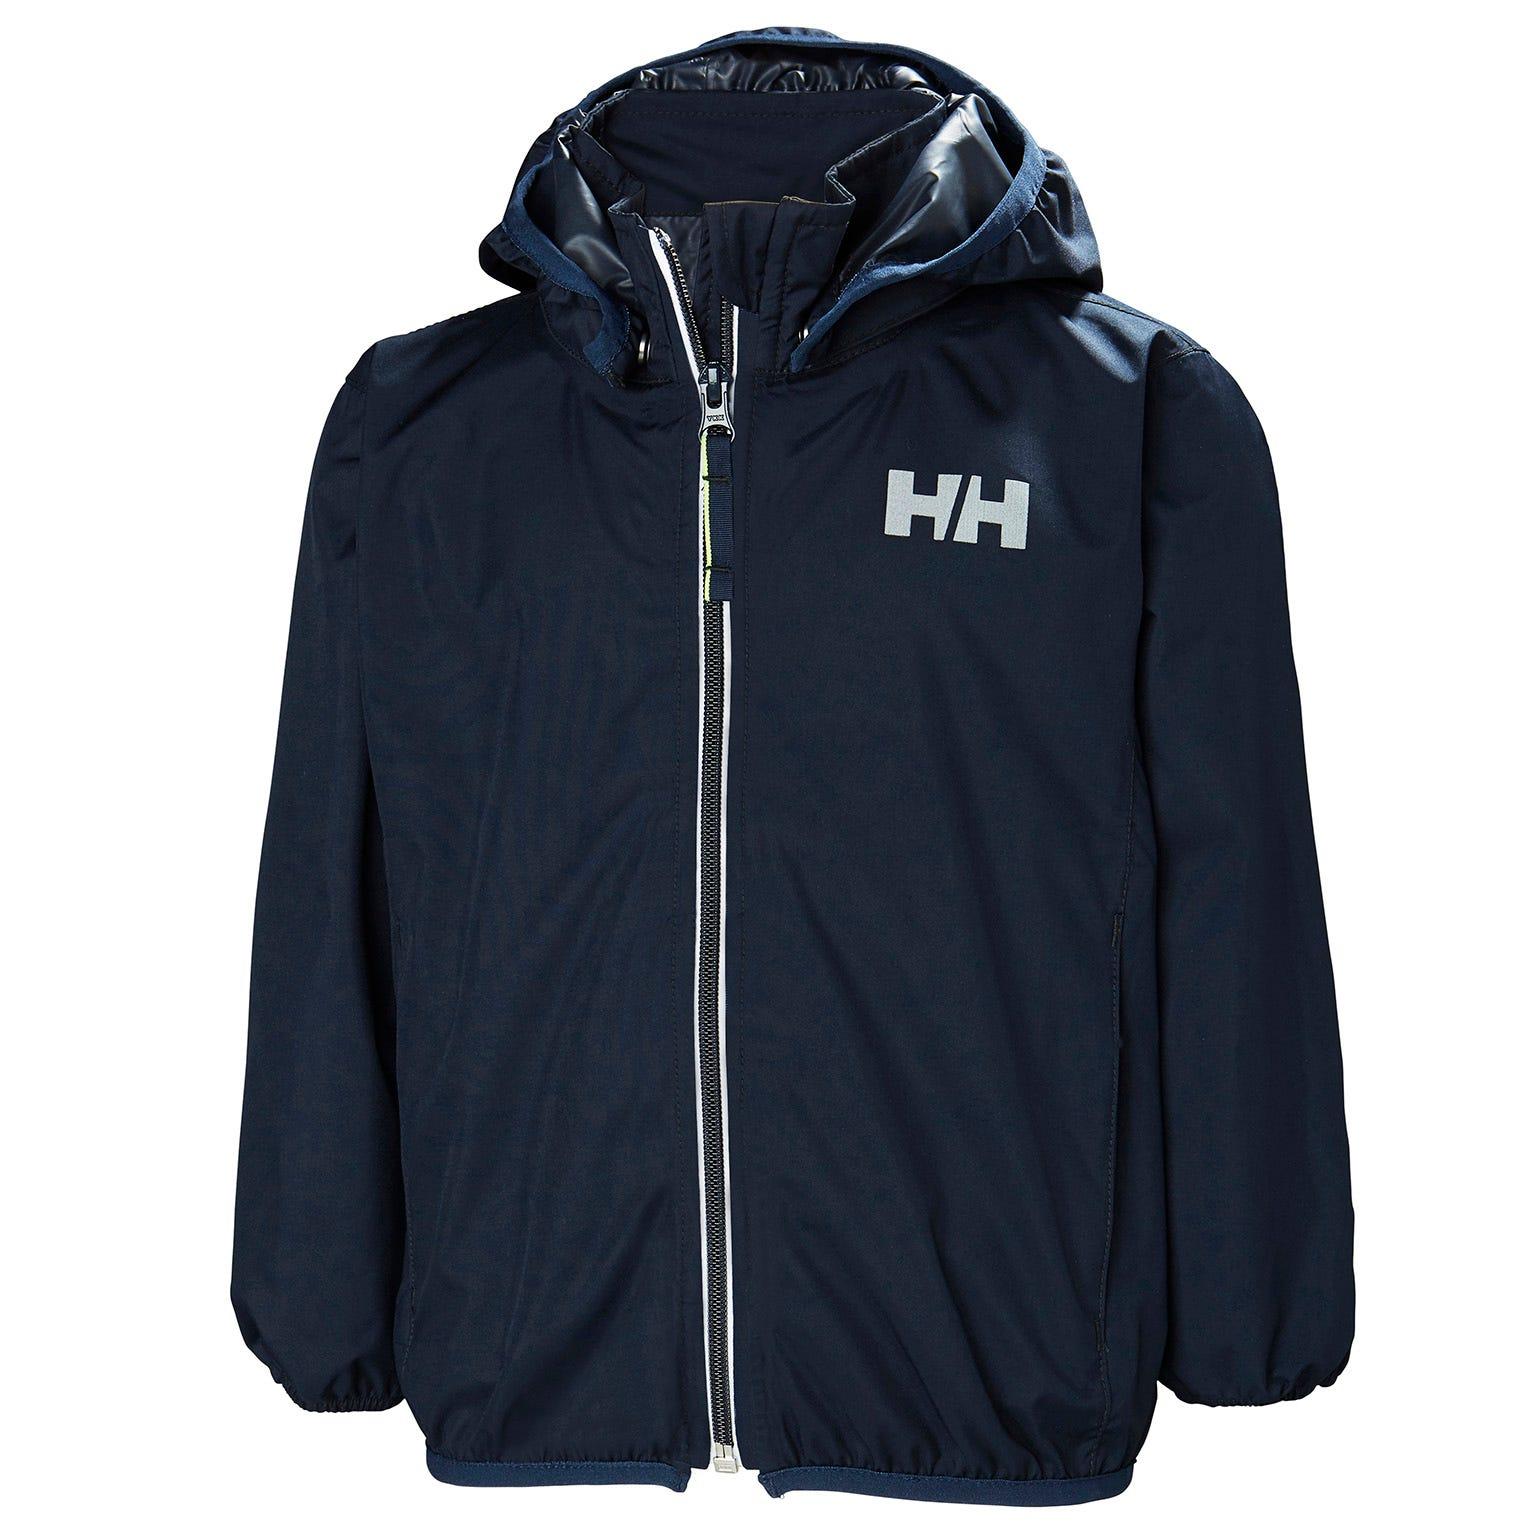 Helly Hansen Kids Helium Packable Jacket Parka Navy 128/8